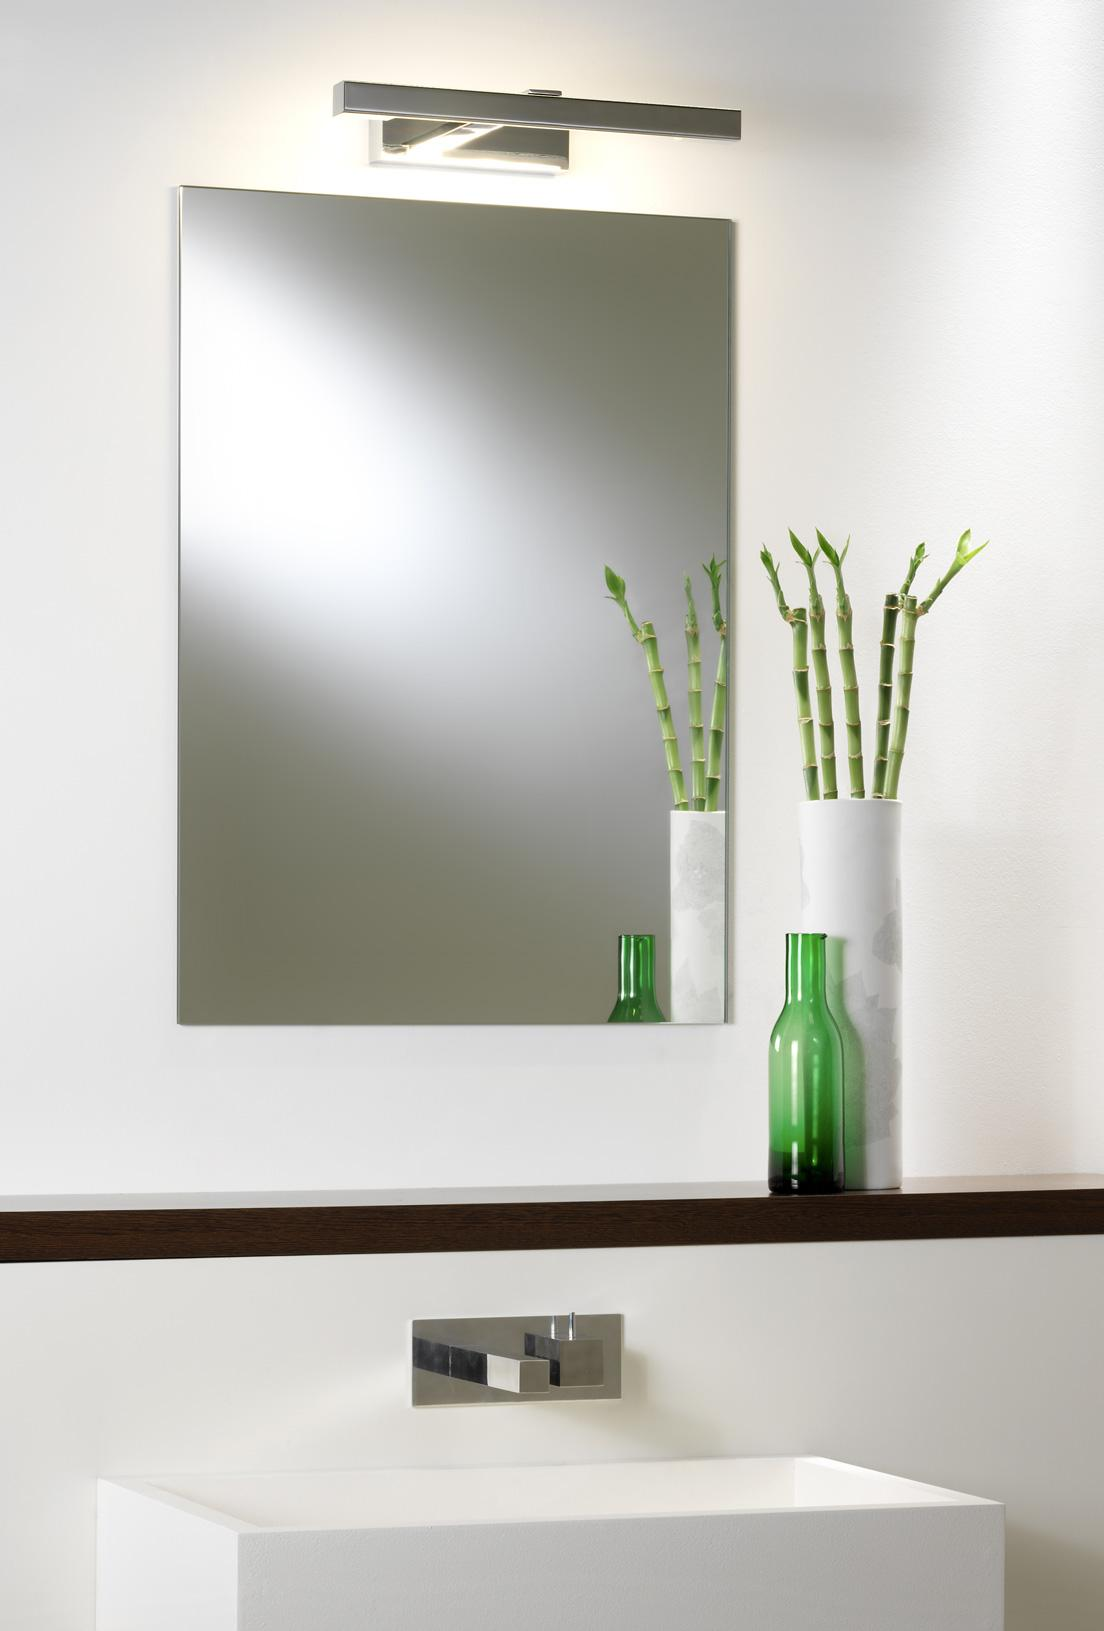 KASHIMA 620 applique specchio bagno